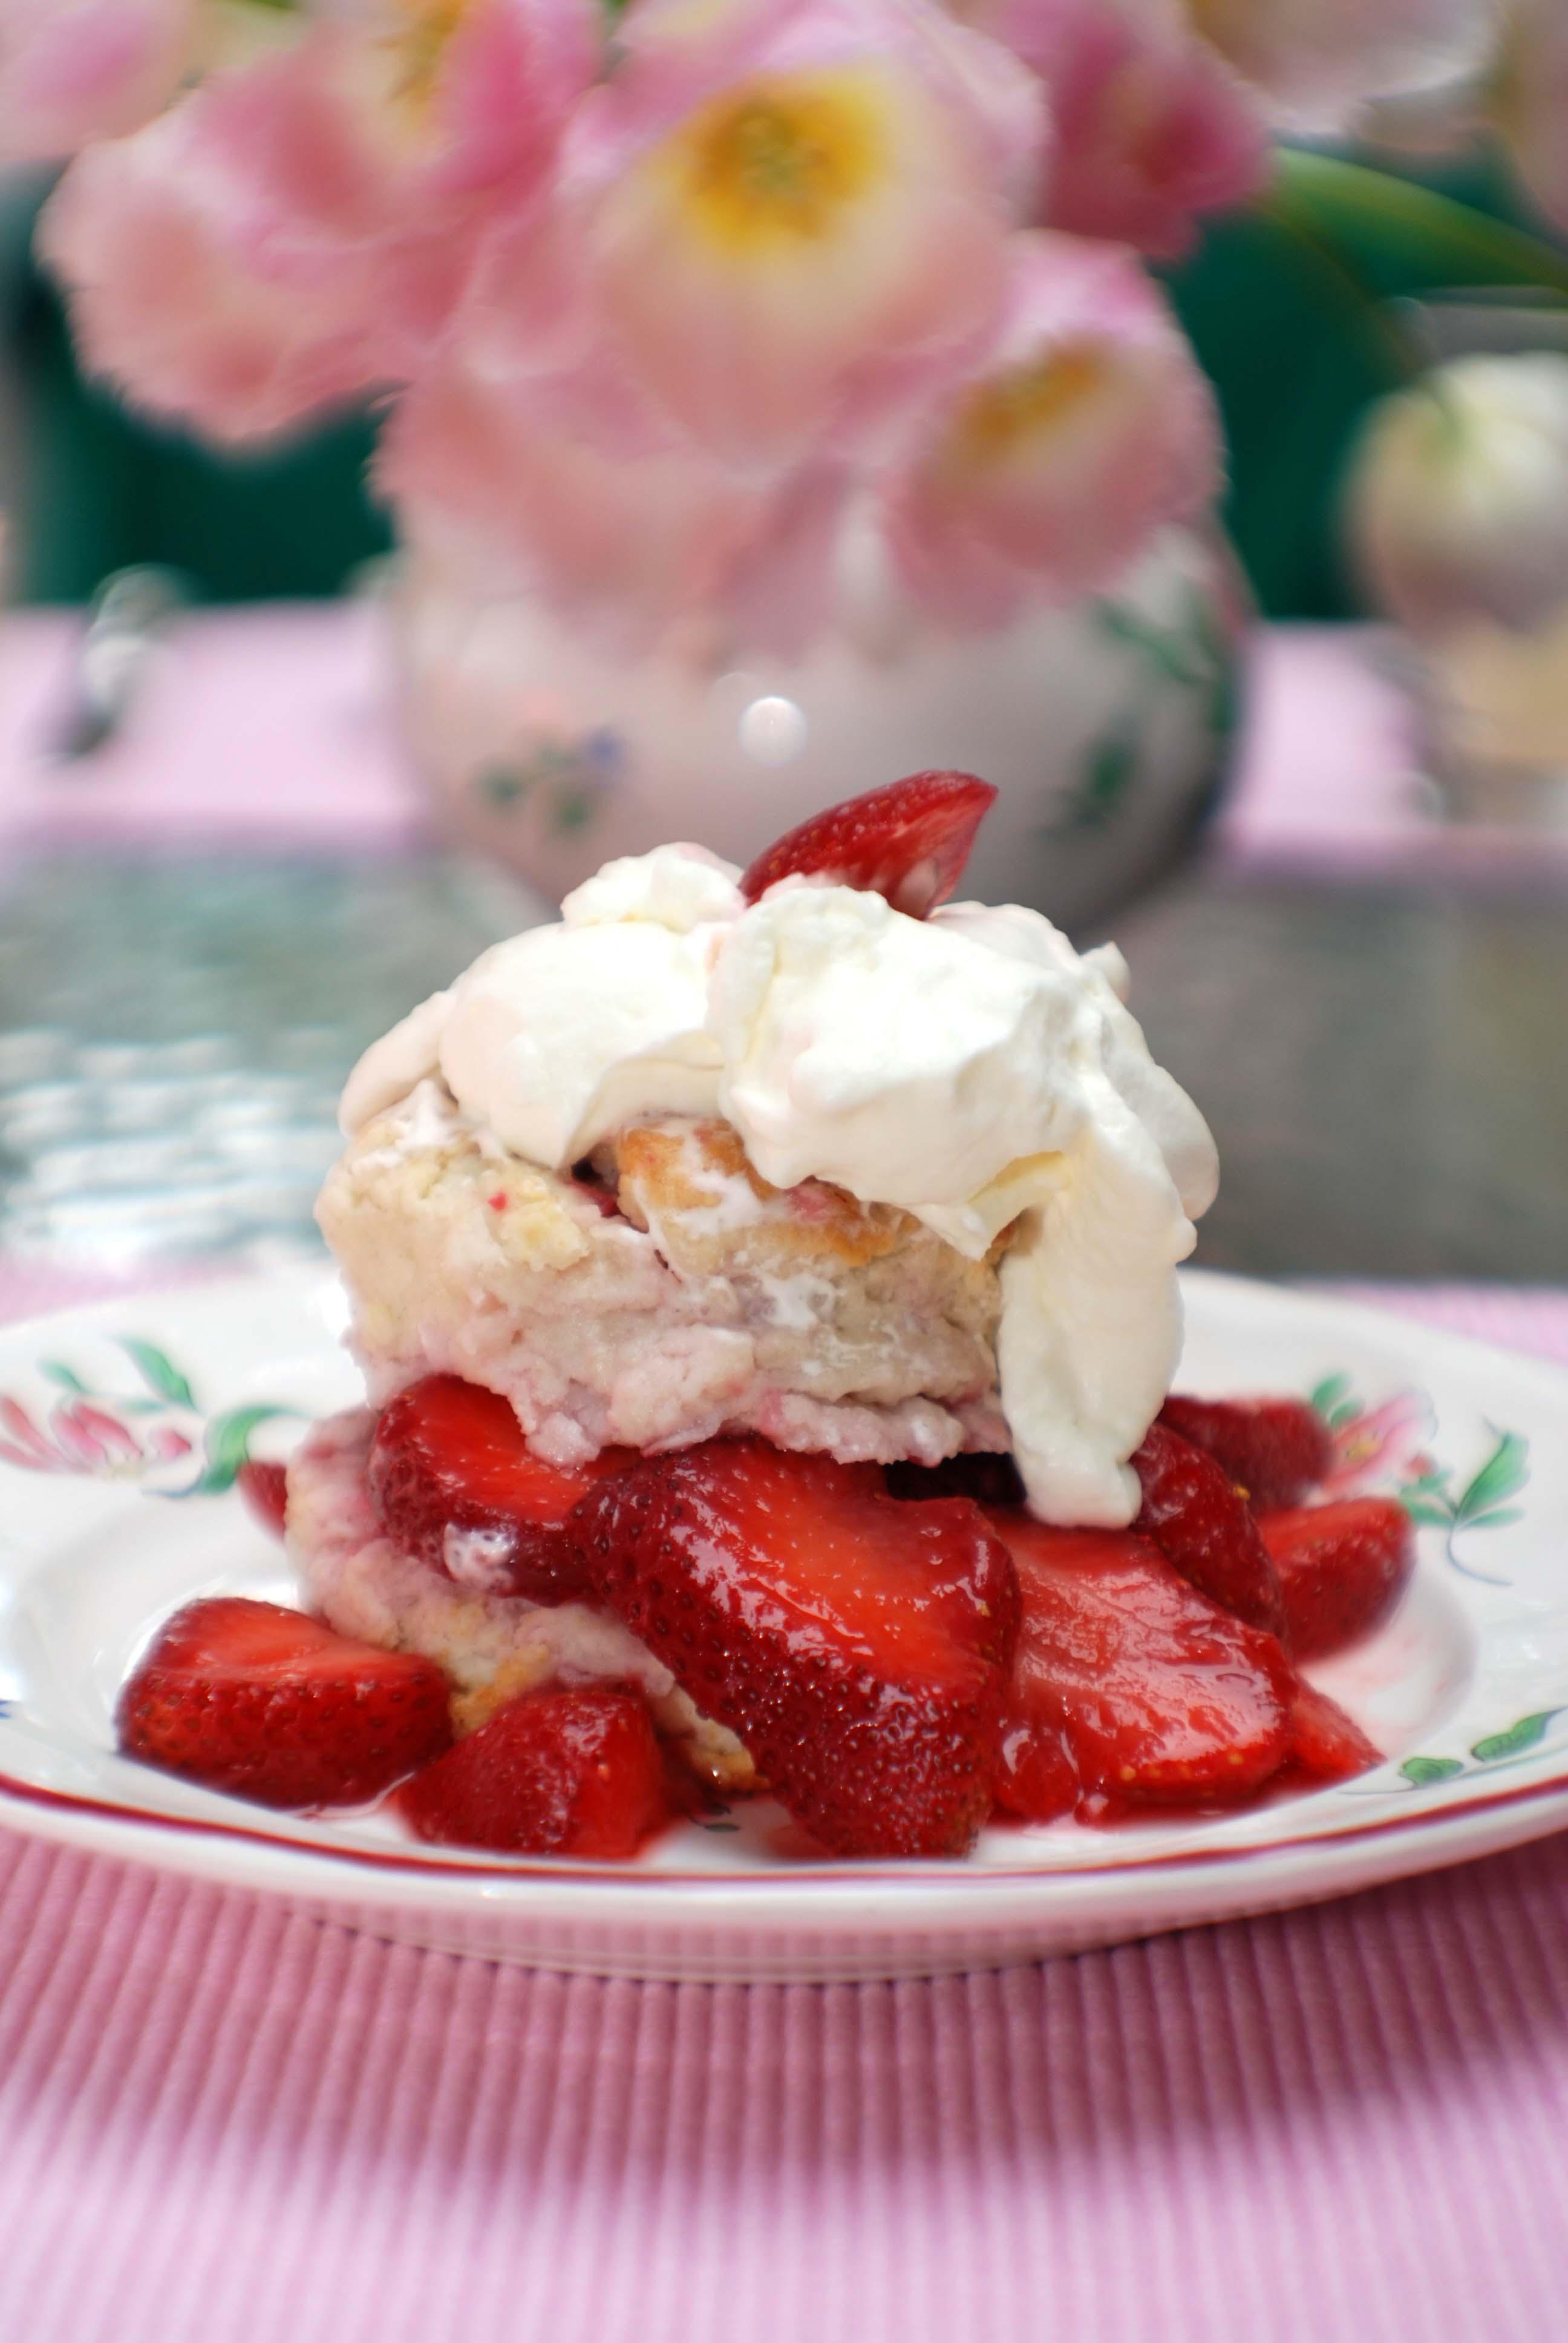 http://www.beyondwonderful.com/images/recipes/desserts_strawberry_shortcake_300x400.jpg